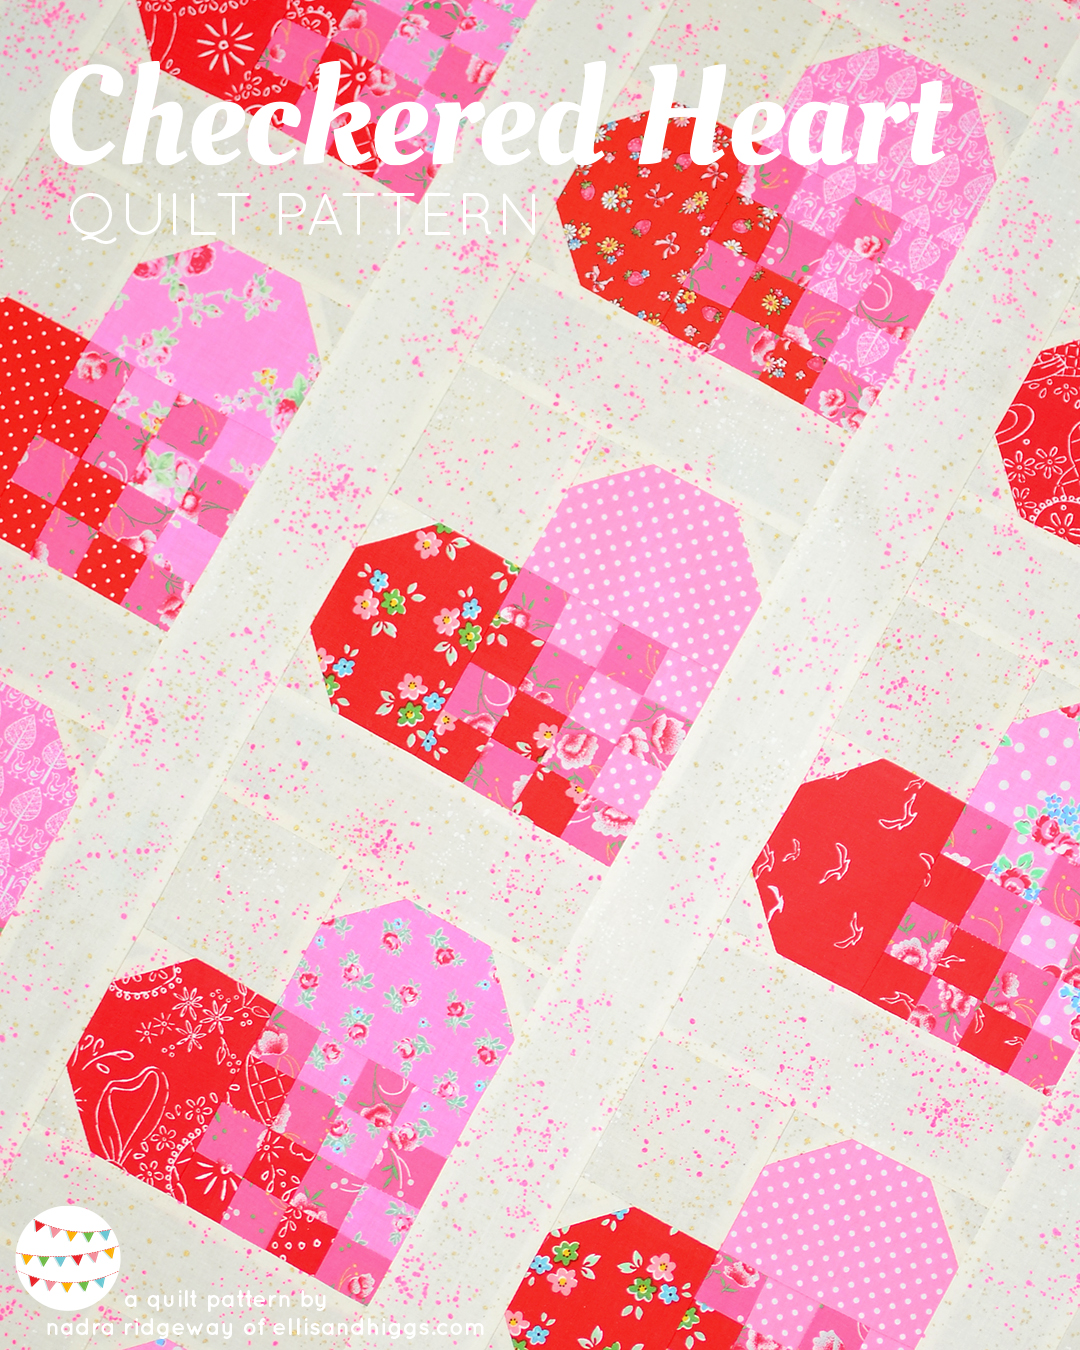 Checkered Heart Quilt Pattern